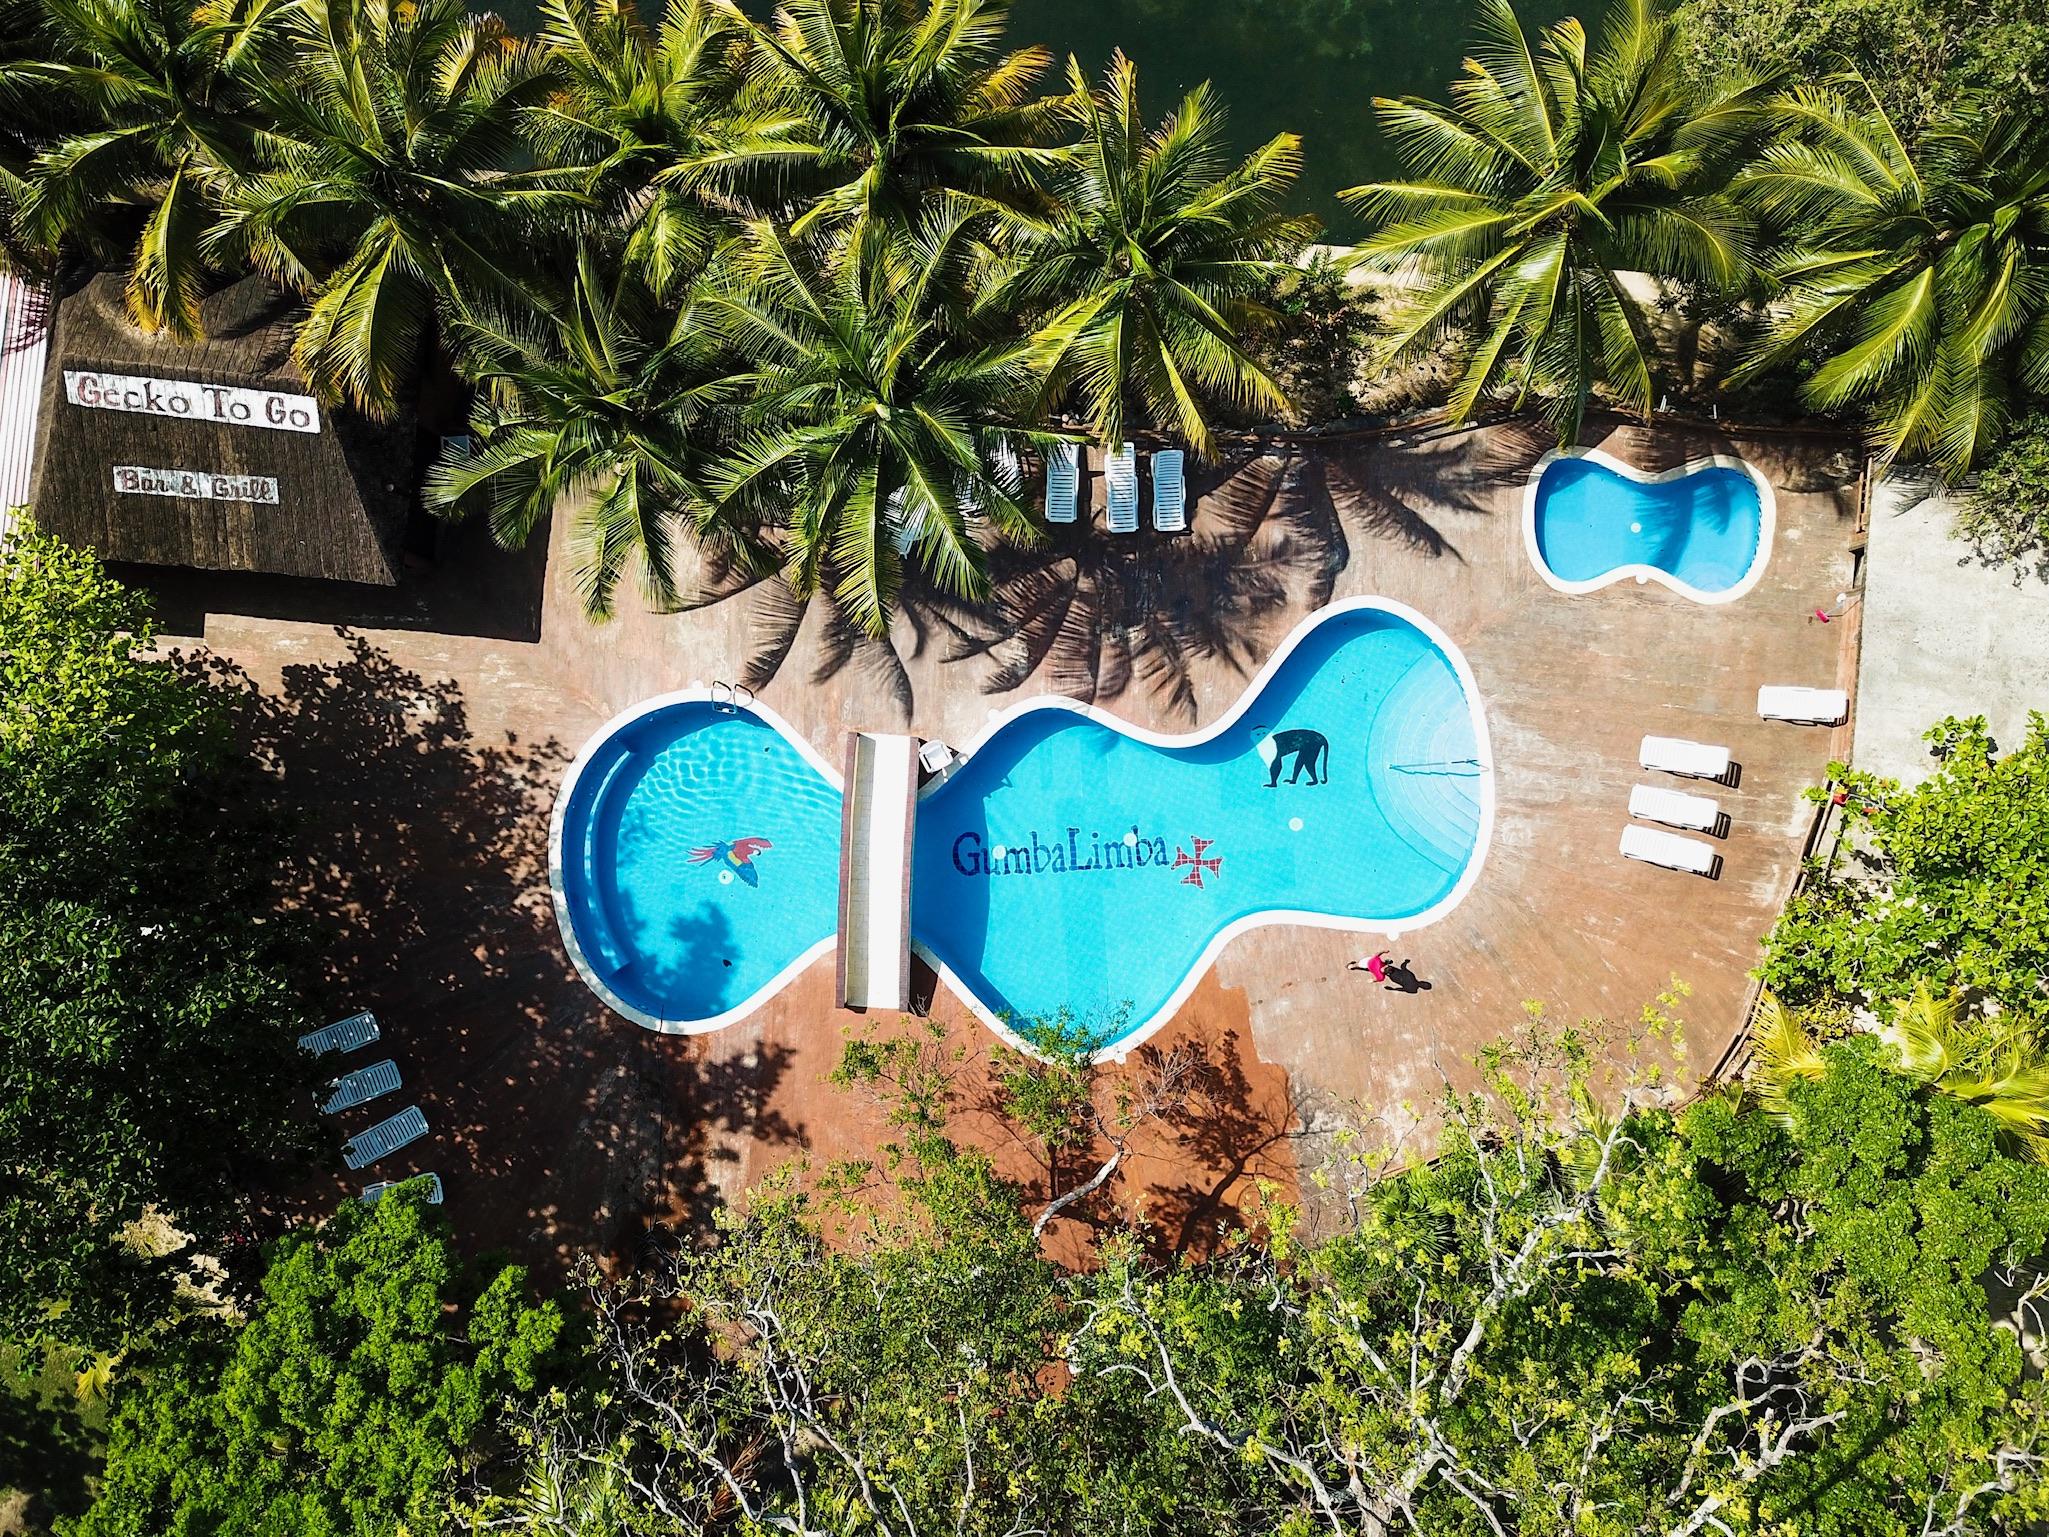 Gumbalimba Park Pool